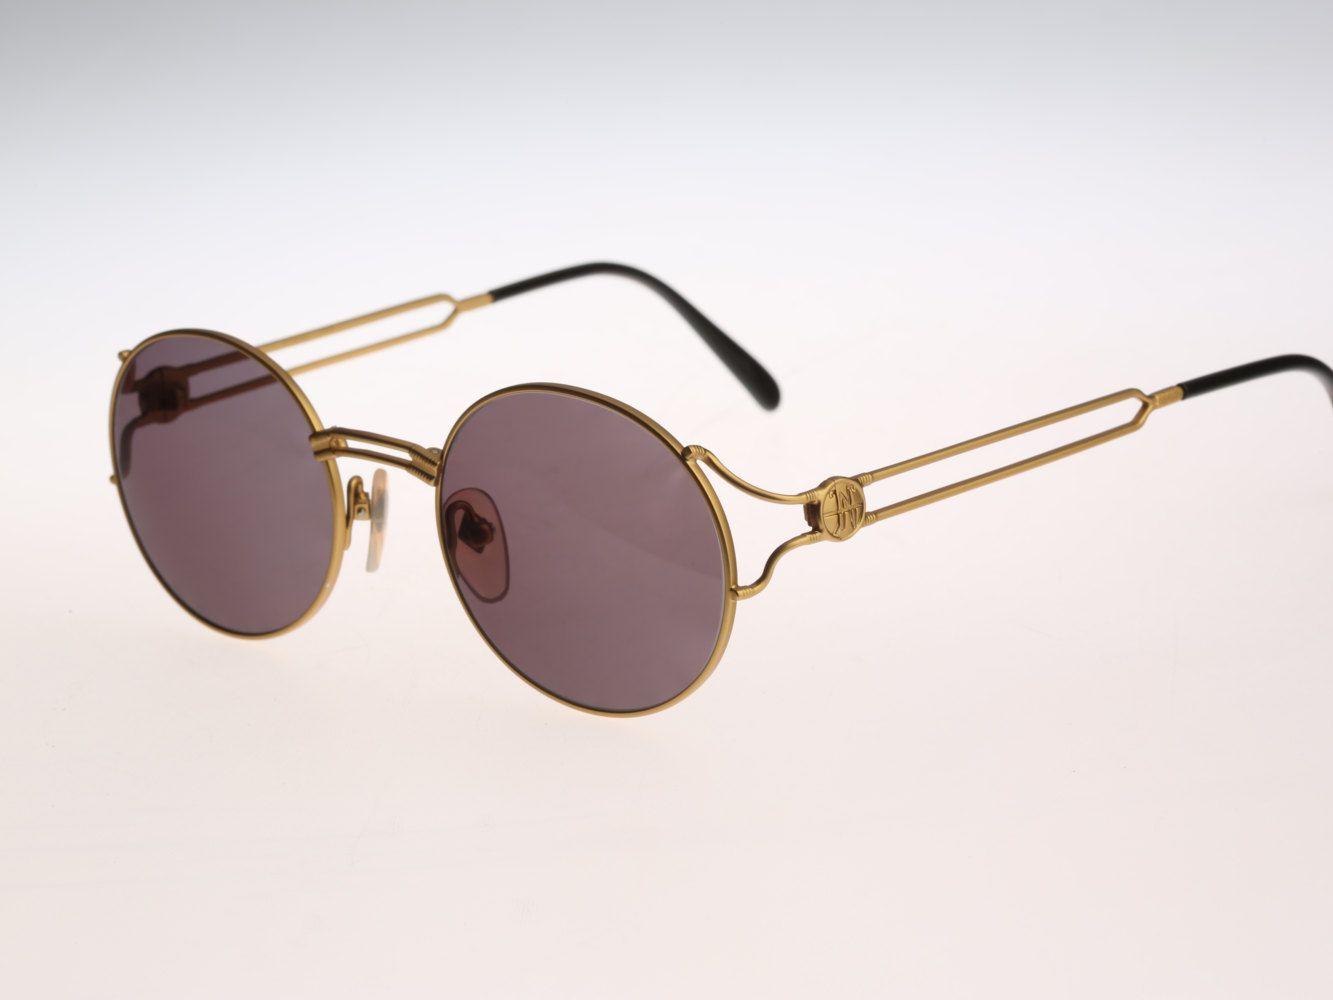 Jean Paul Gaultier  57-6102 Vintage sunglasses NOS  90's designer eyewear